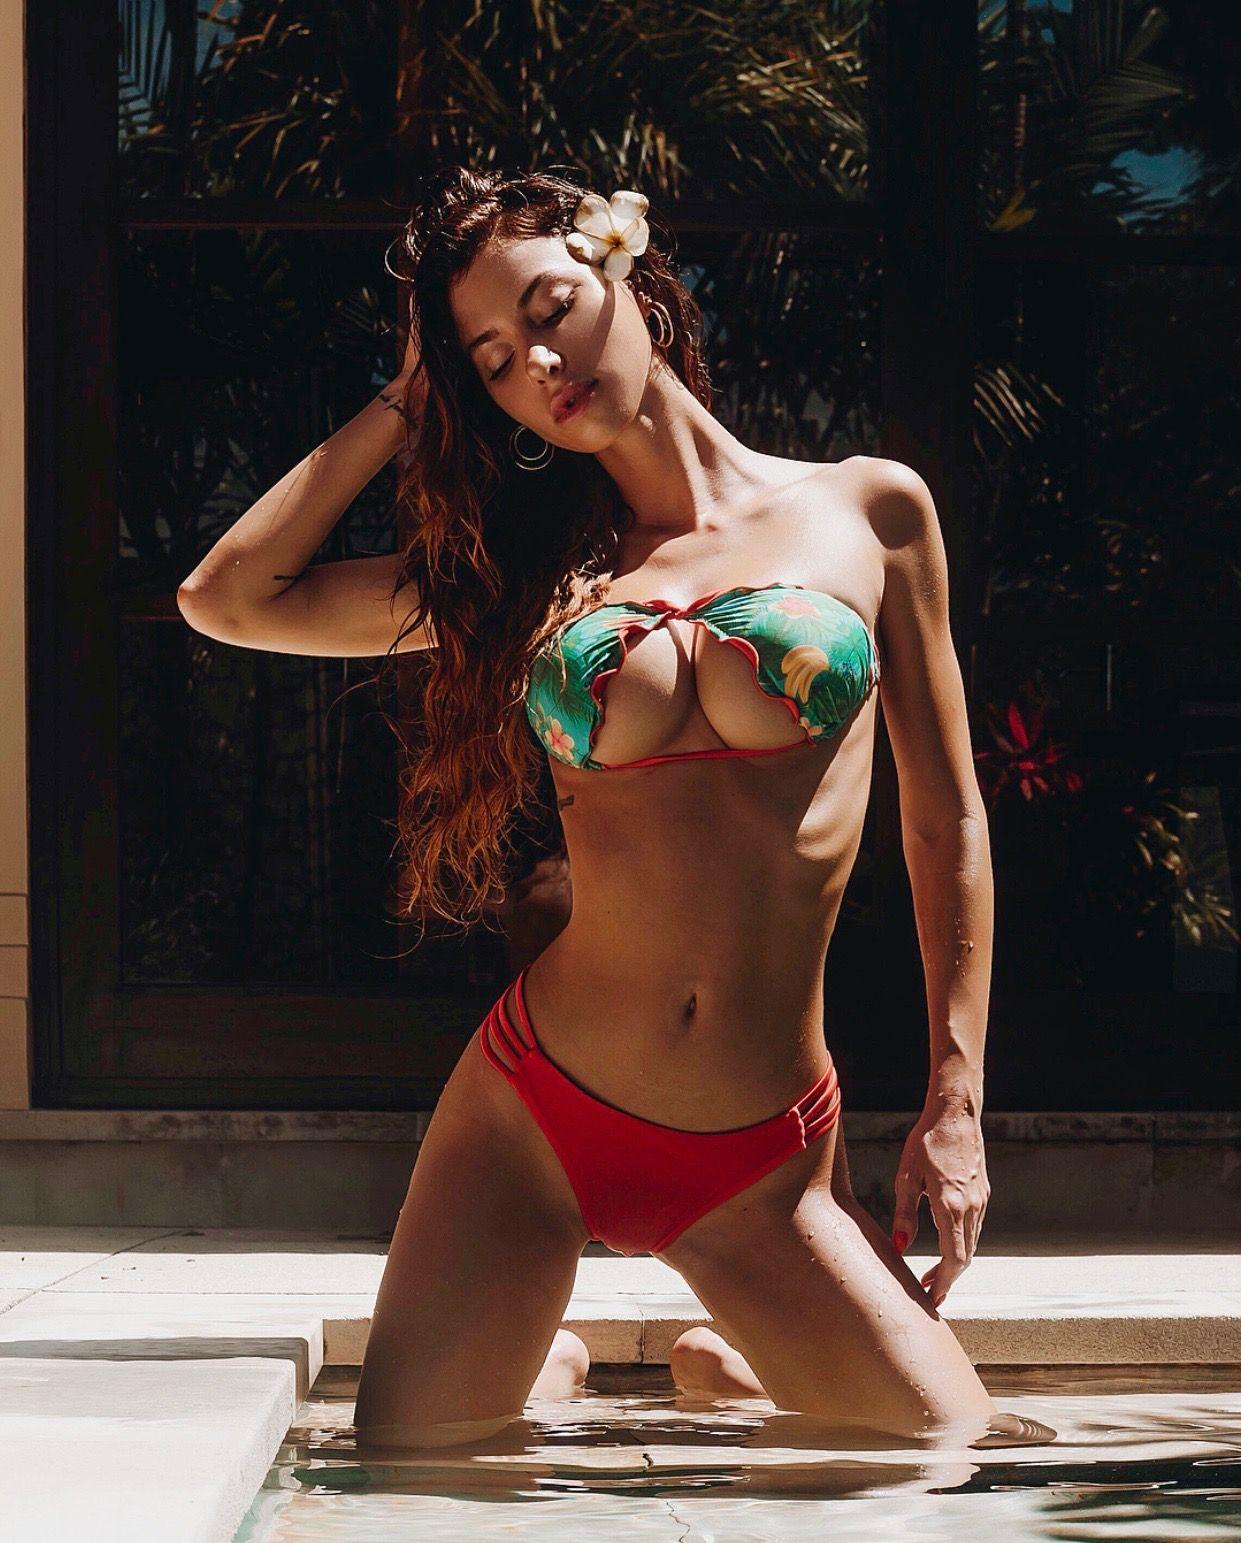 bra Youtube Valentina Fradegrada naked photo 2017